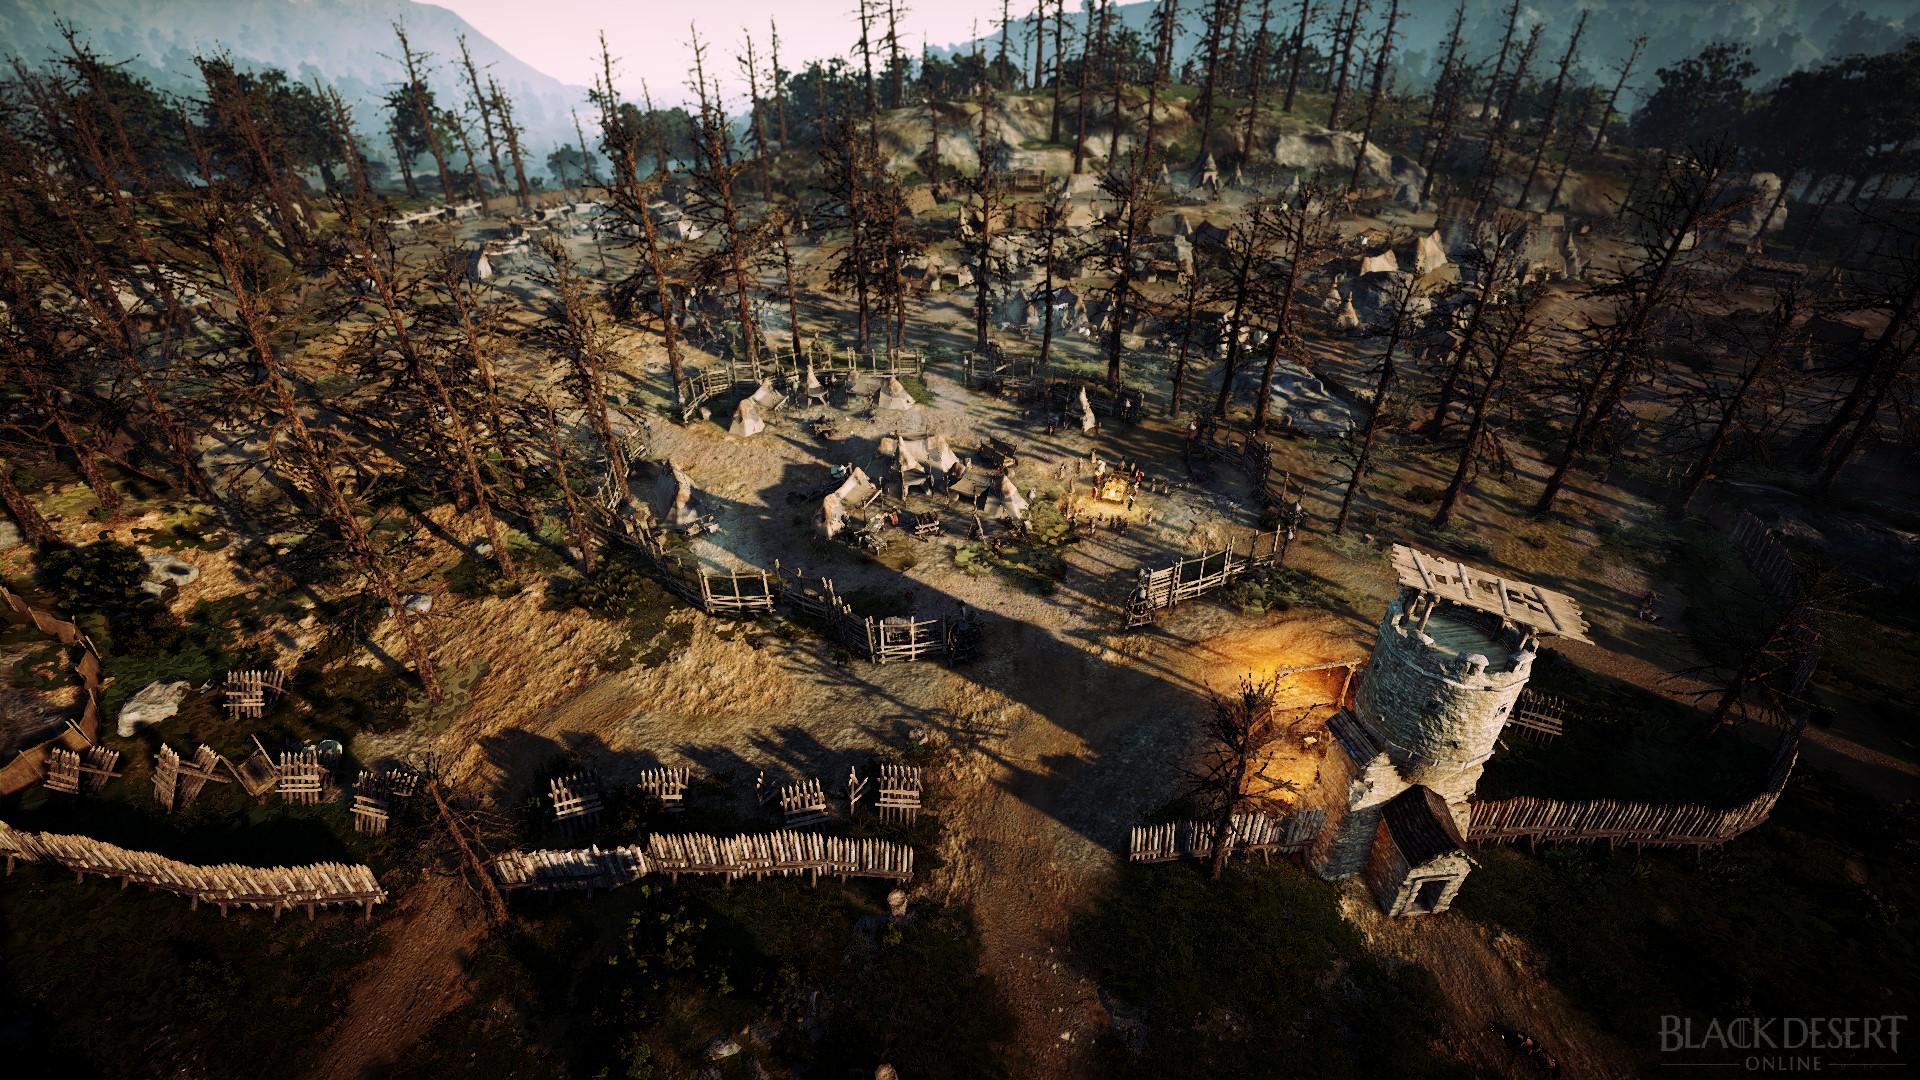 Abandoned Land | Black Desert Wiki | FANDOM powered by Wikia